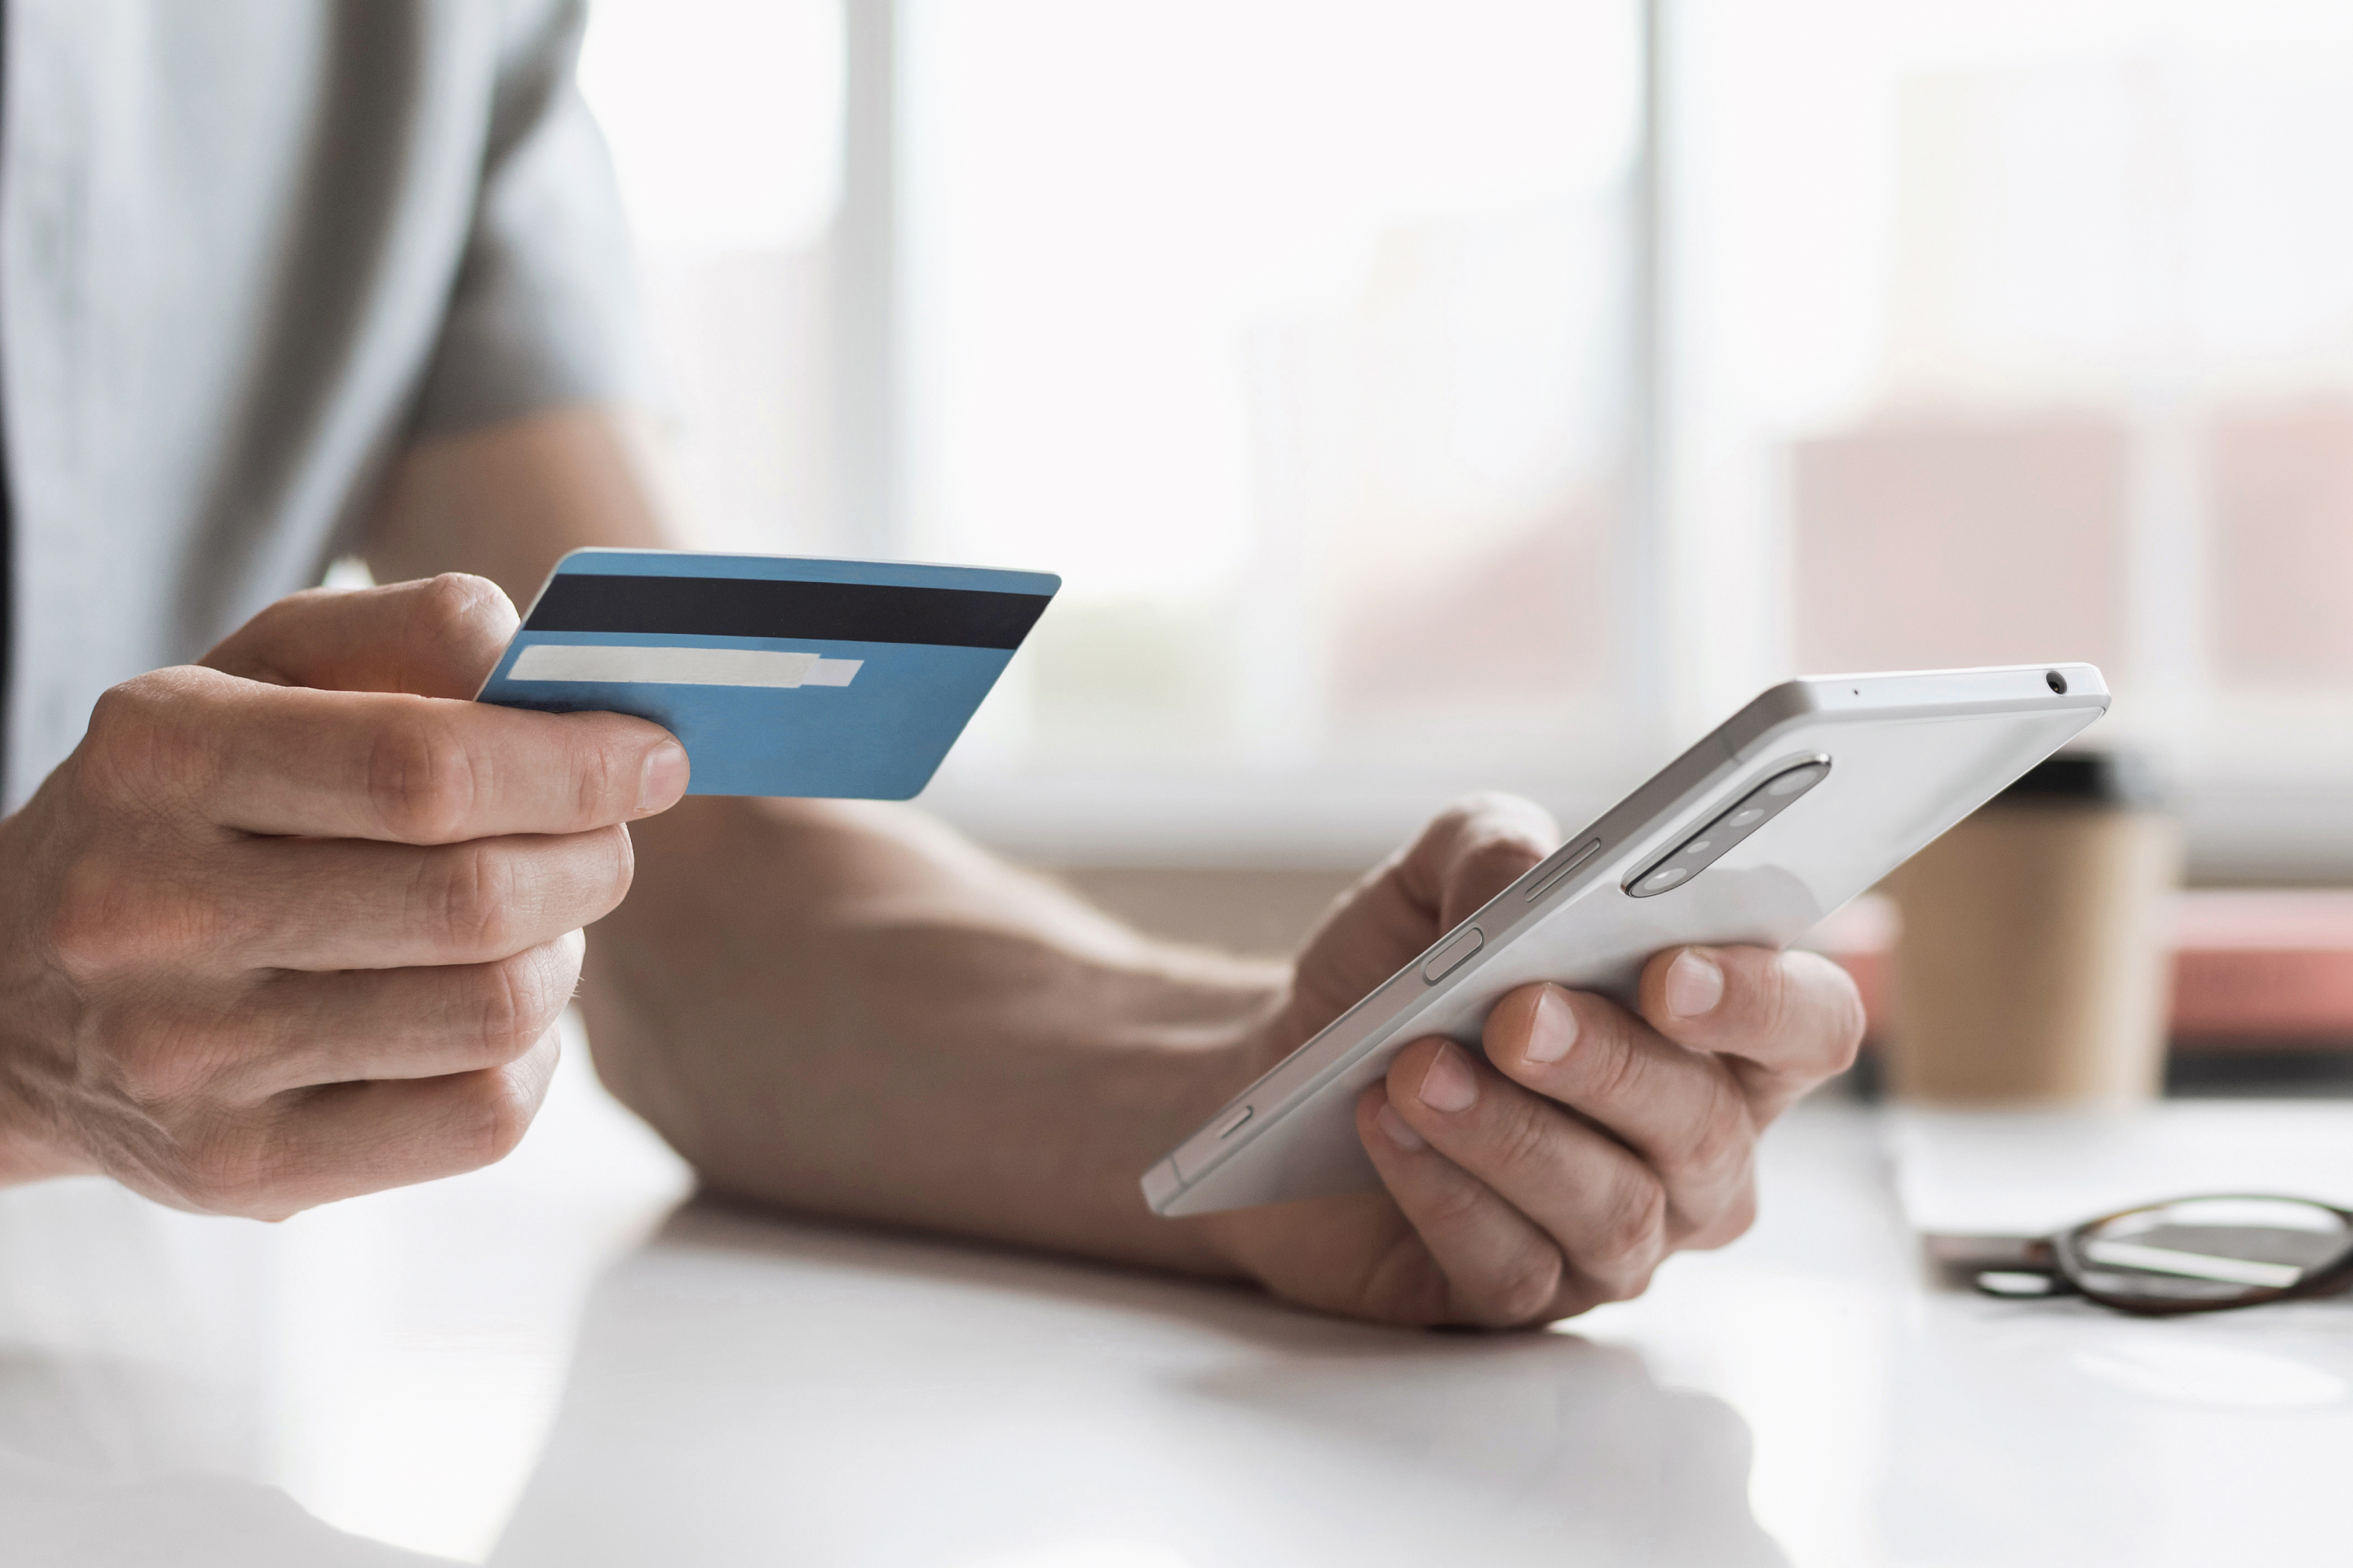 5 Ways Twenty-Somethings Can Build Their Credit